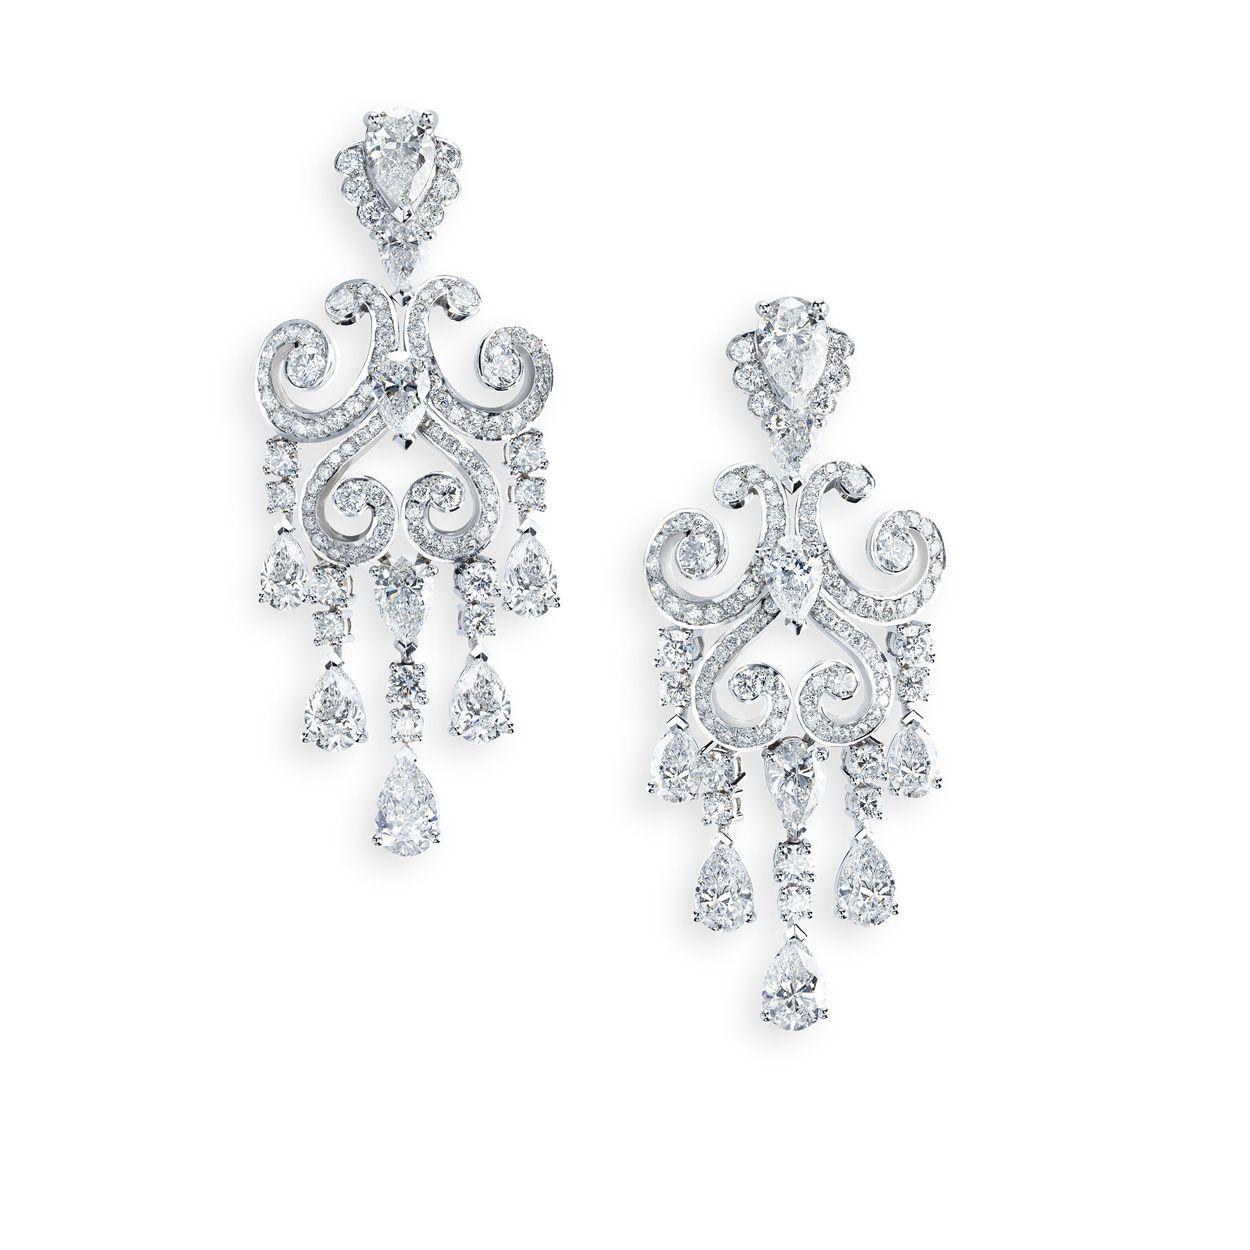 FABERGE Giselle earrings / Сережки Giselle от FABERGE